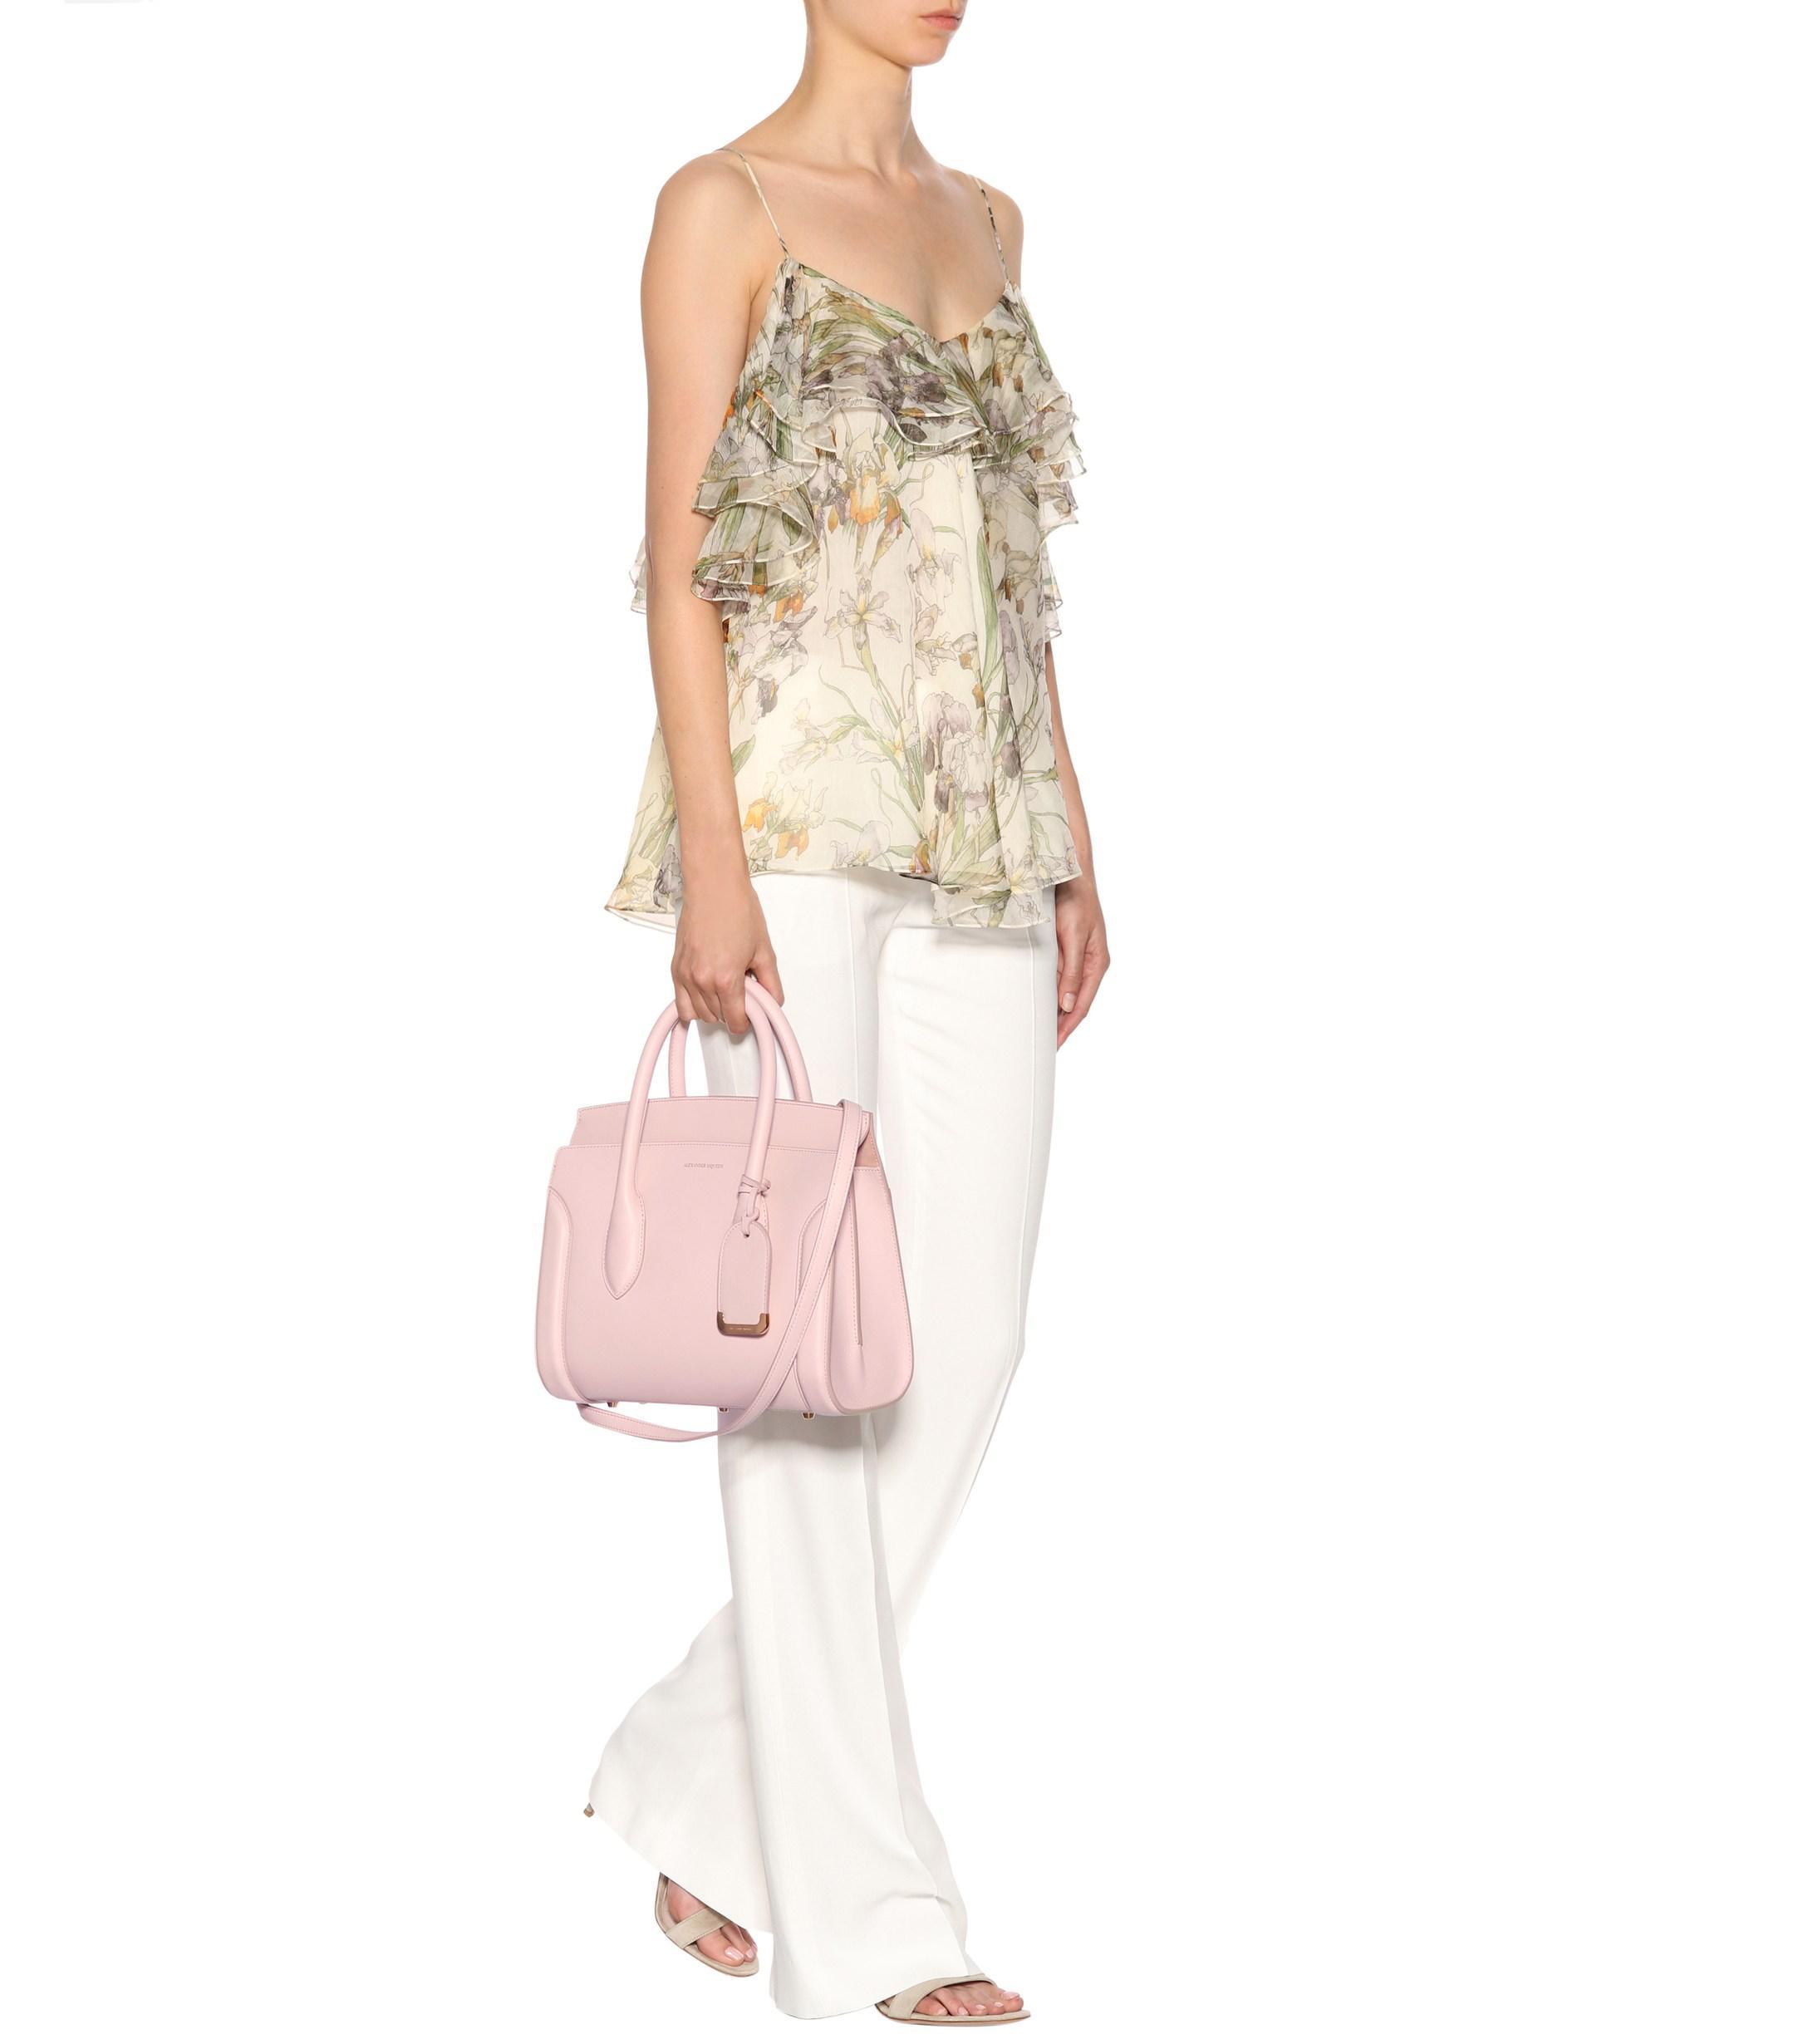 b78ac79f49f3 Alexander McQueen Heroine 30 Leather Shoulder Bag in Pink - Lyst